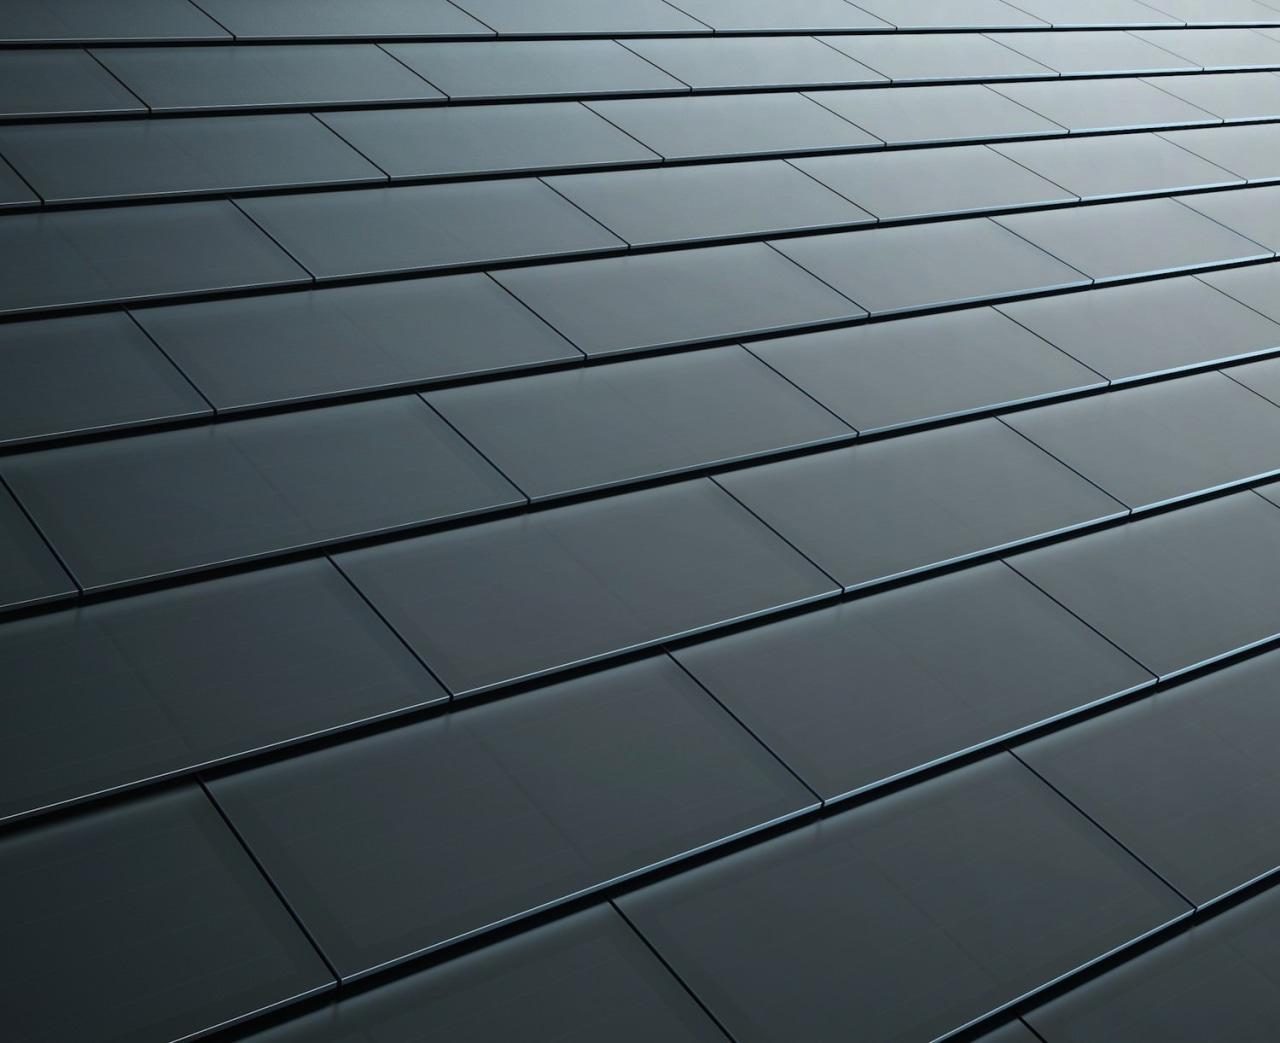 Tesla Solar Roof tiles angle, daylighting, floor, light, line, material, road surface, sky, texture, wood, gray, black